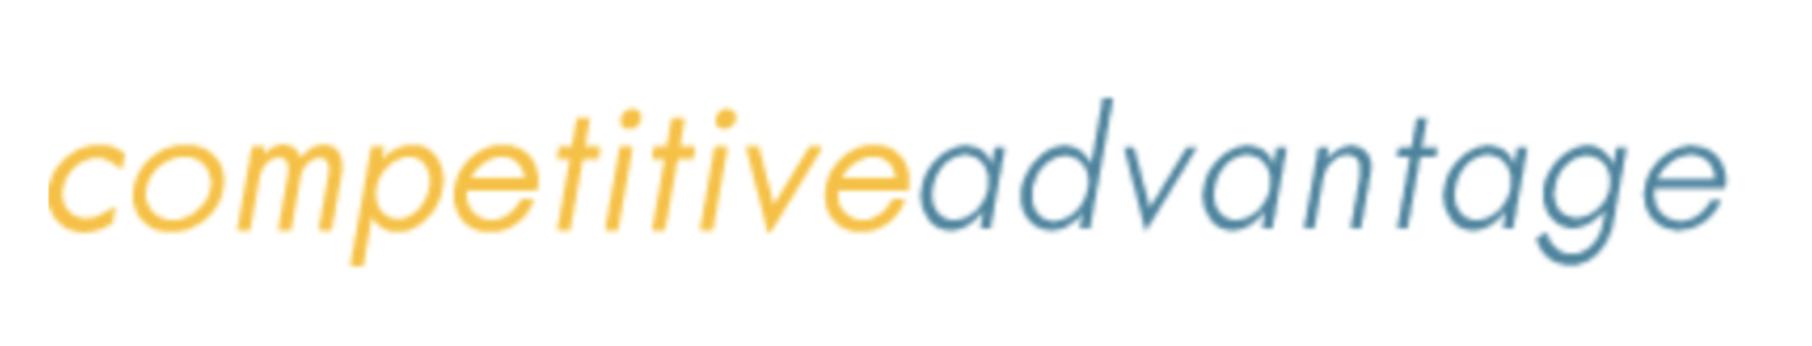 Competitive Advantage Logo